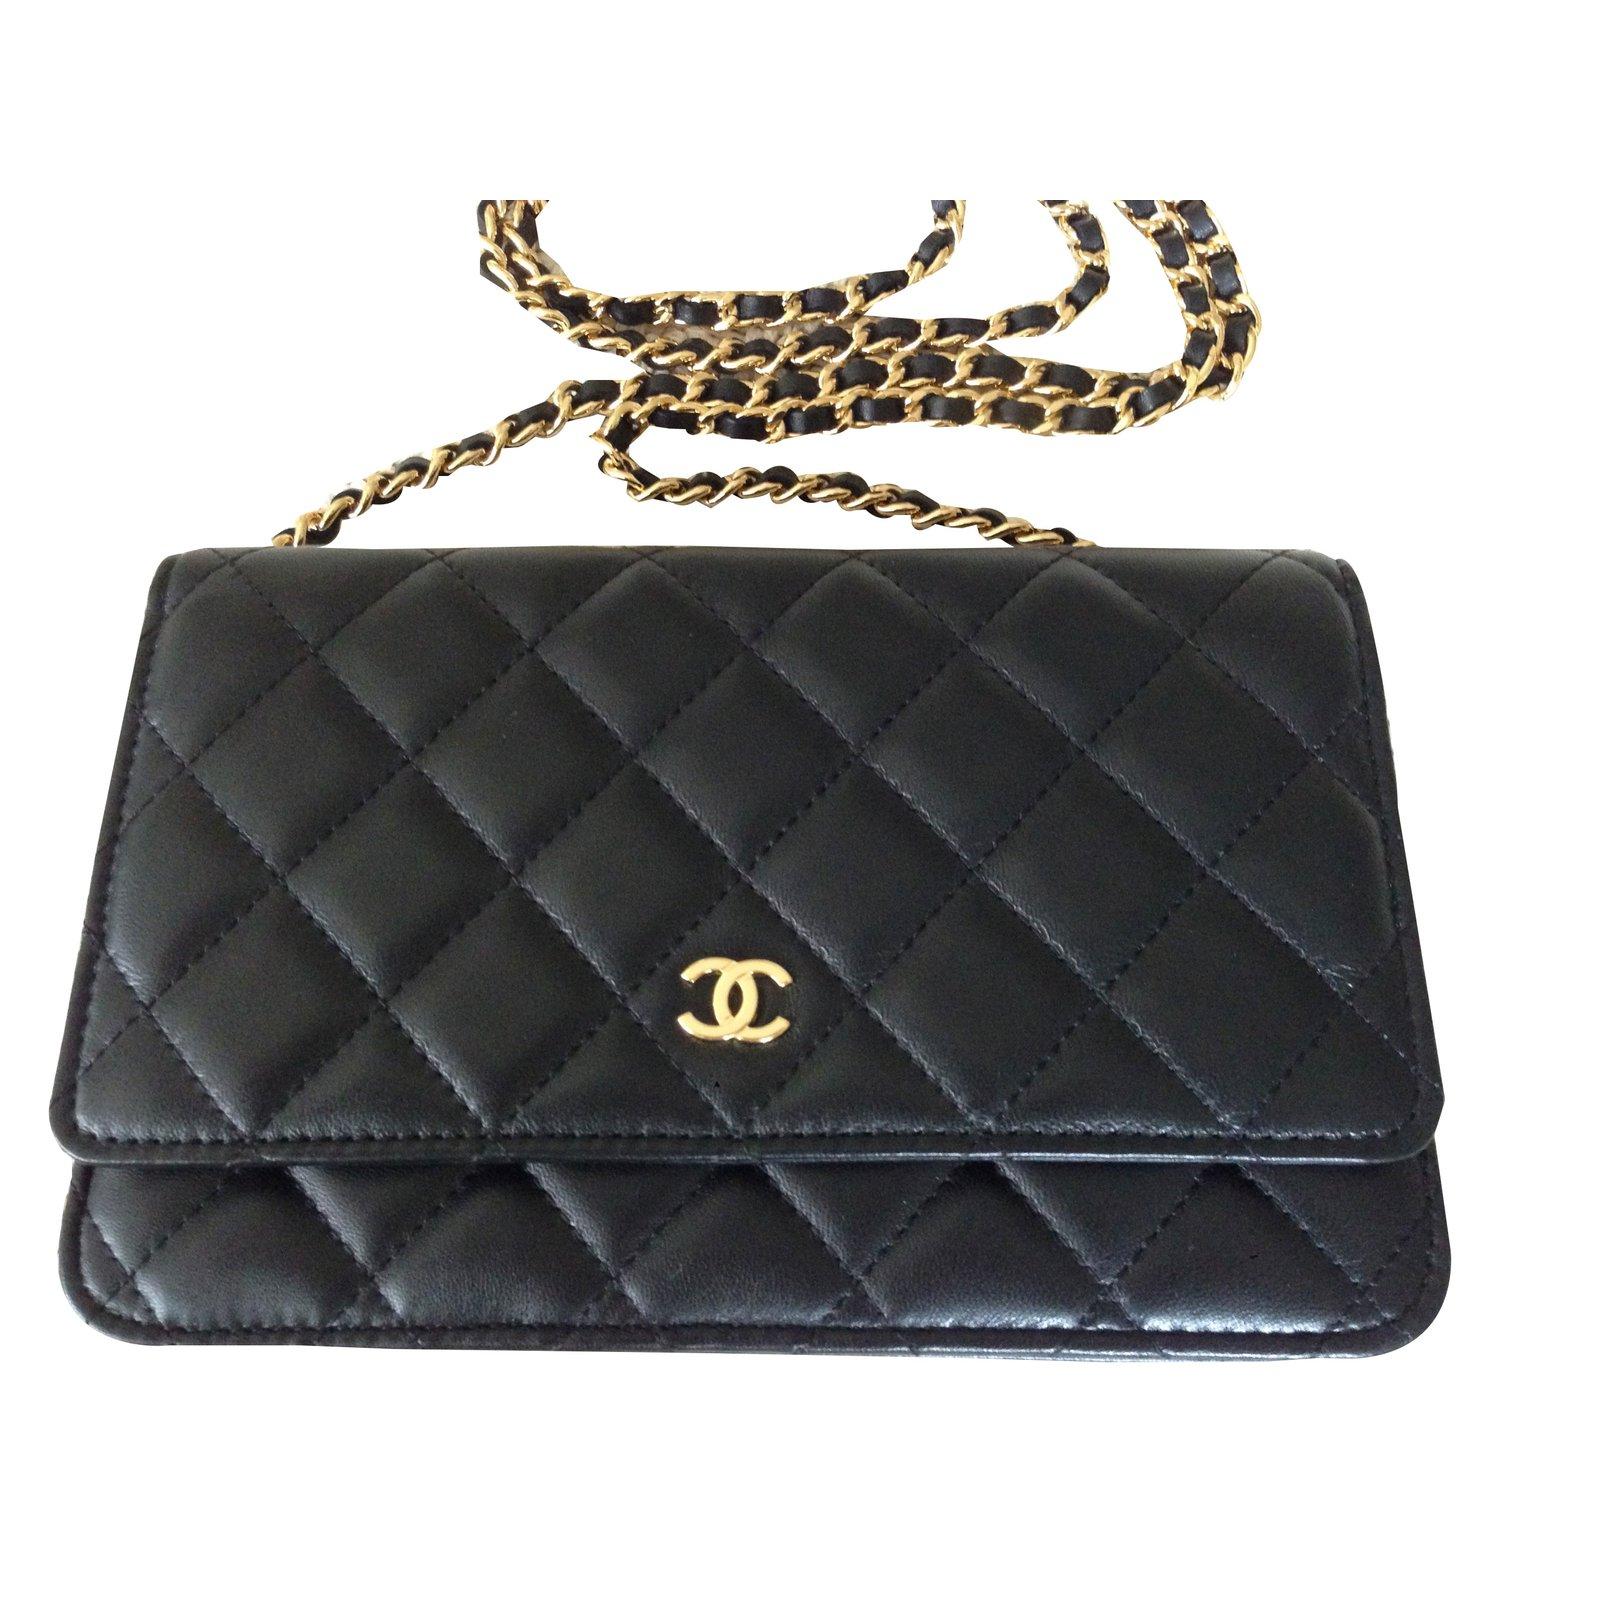 f27b3e8ff5 Chanel Wallet On Chain Handbags Leather Black ref.43455 - Joli Closet